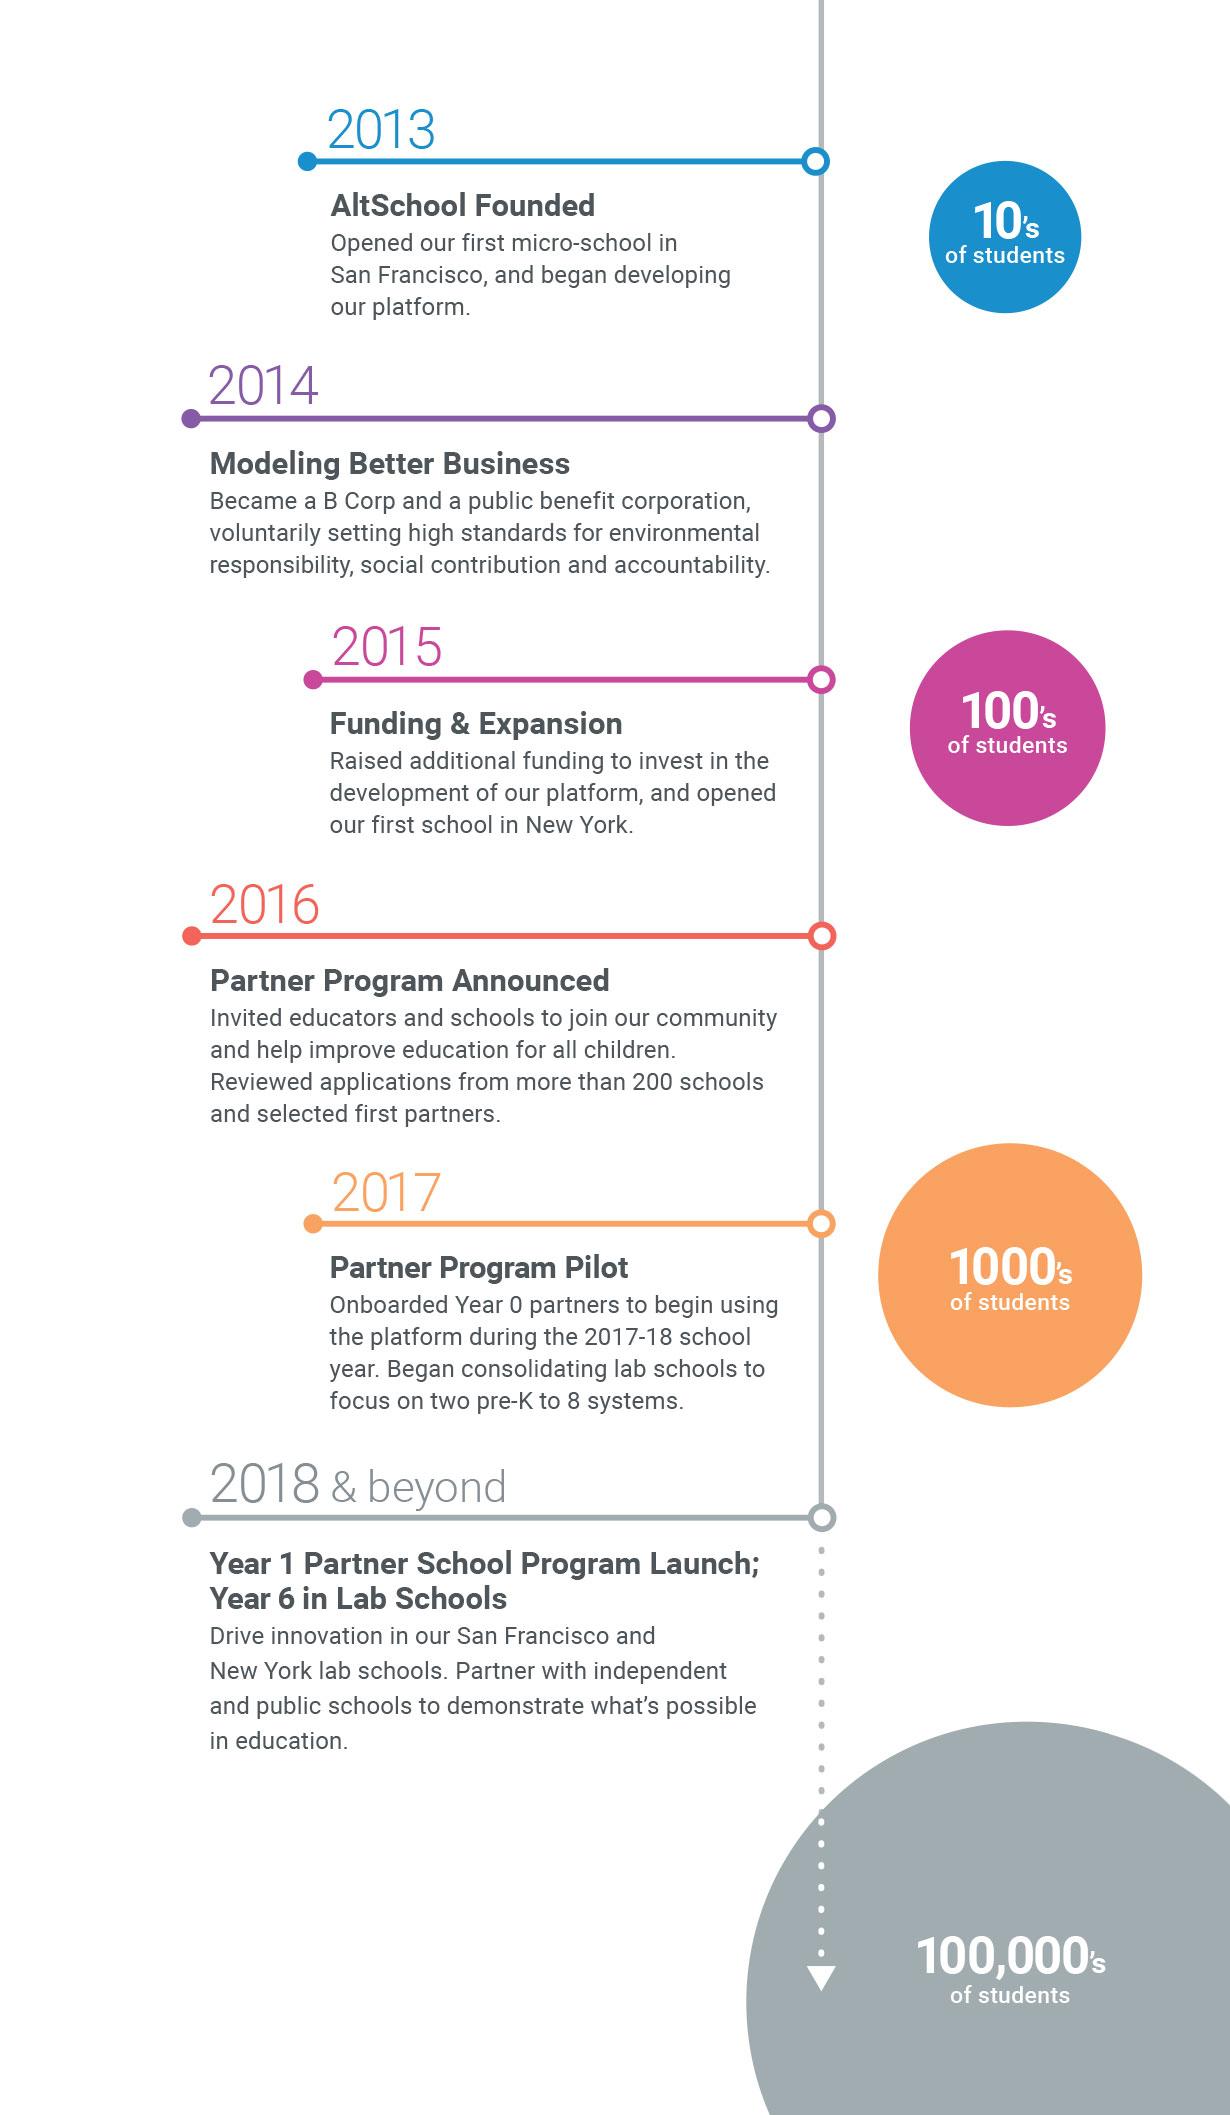 history_of_altschool